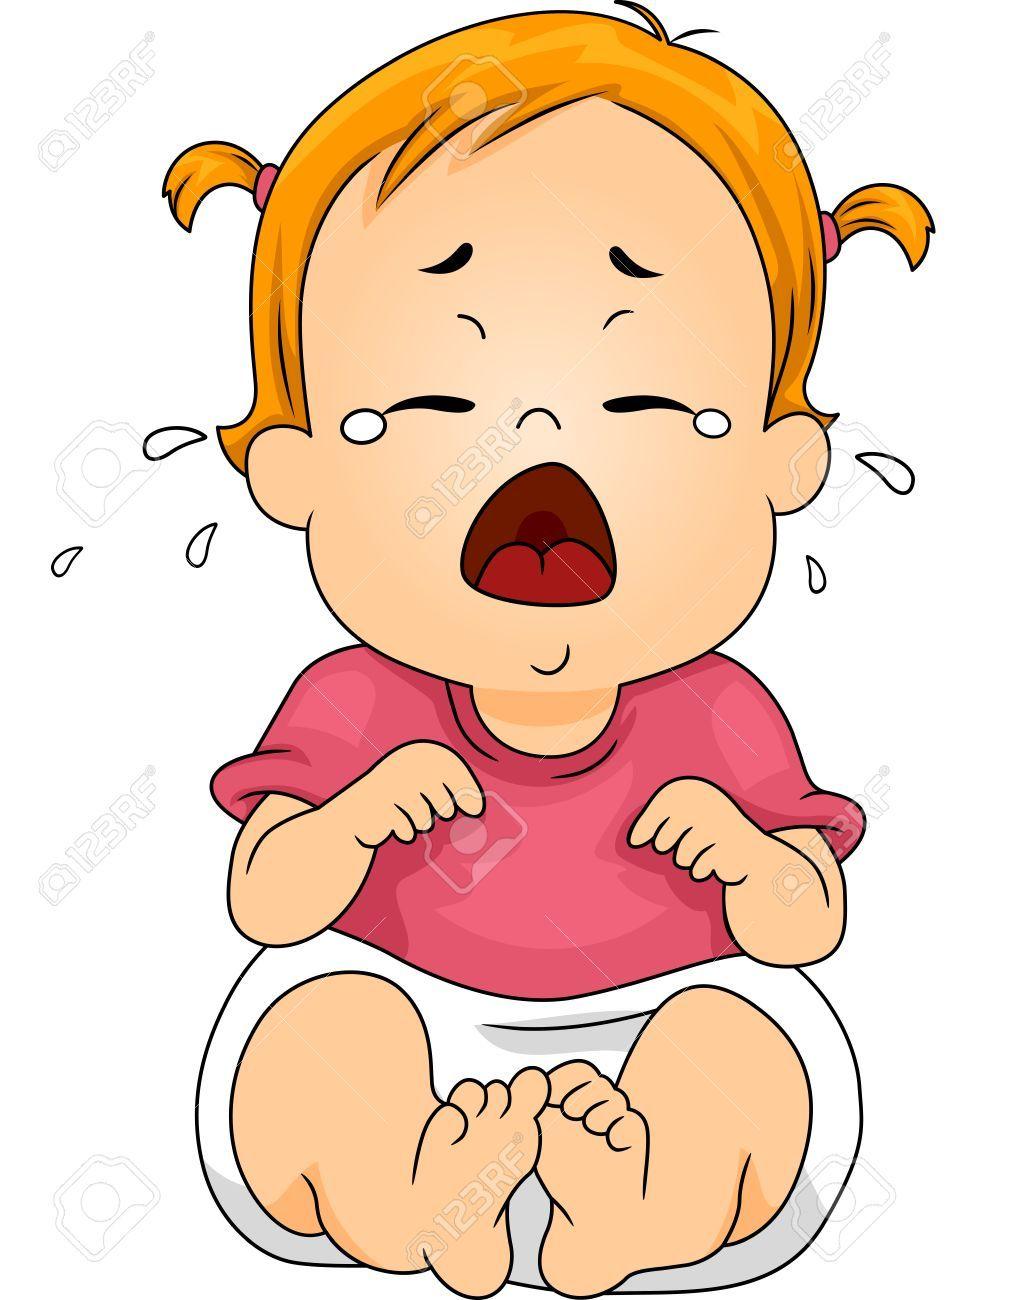 Crying Baby Drawing.